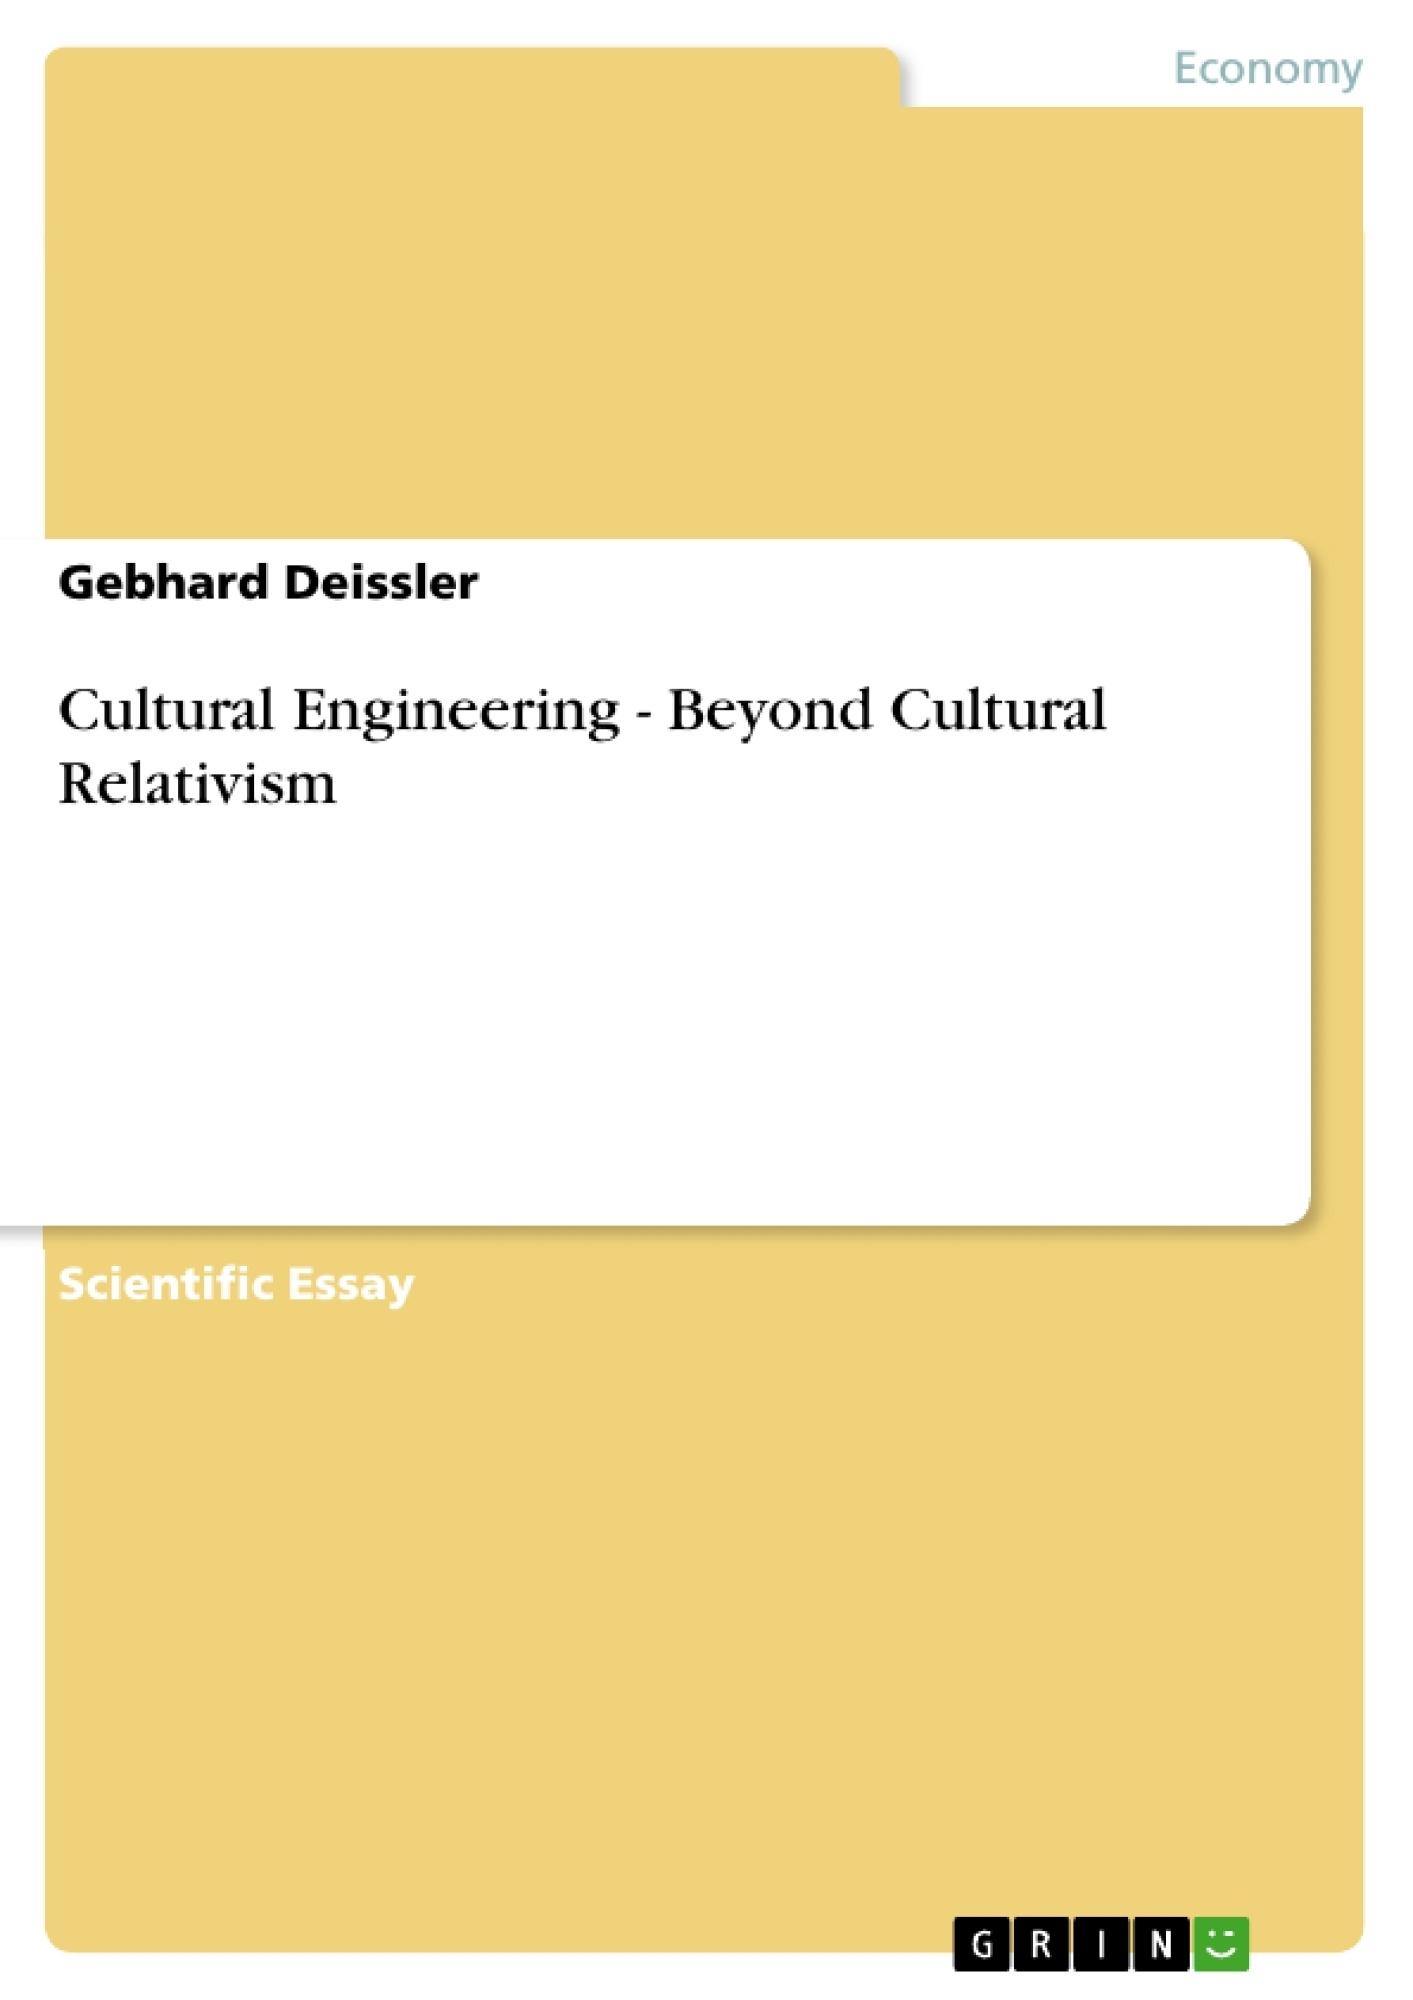 Title: Cultural Engineering - Beyond Cultural Relativism